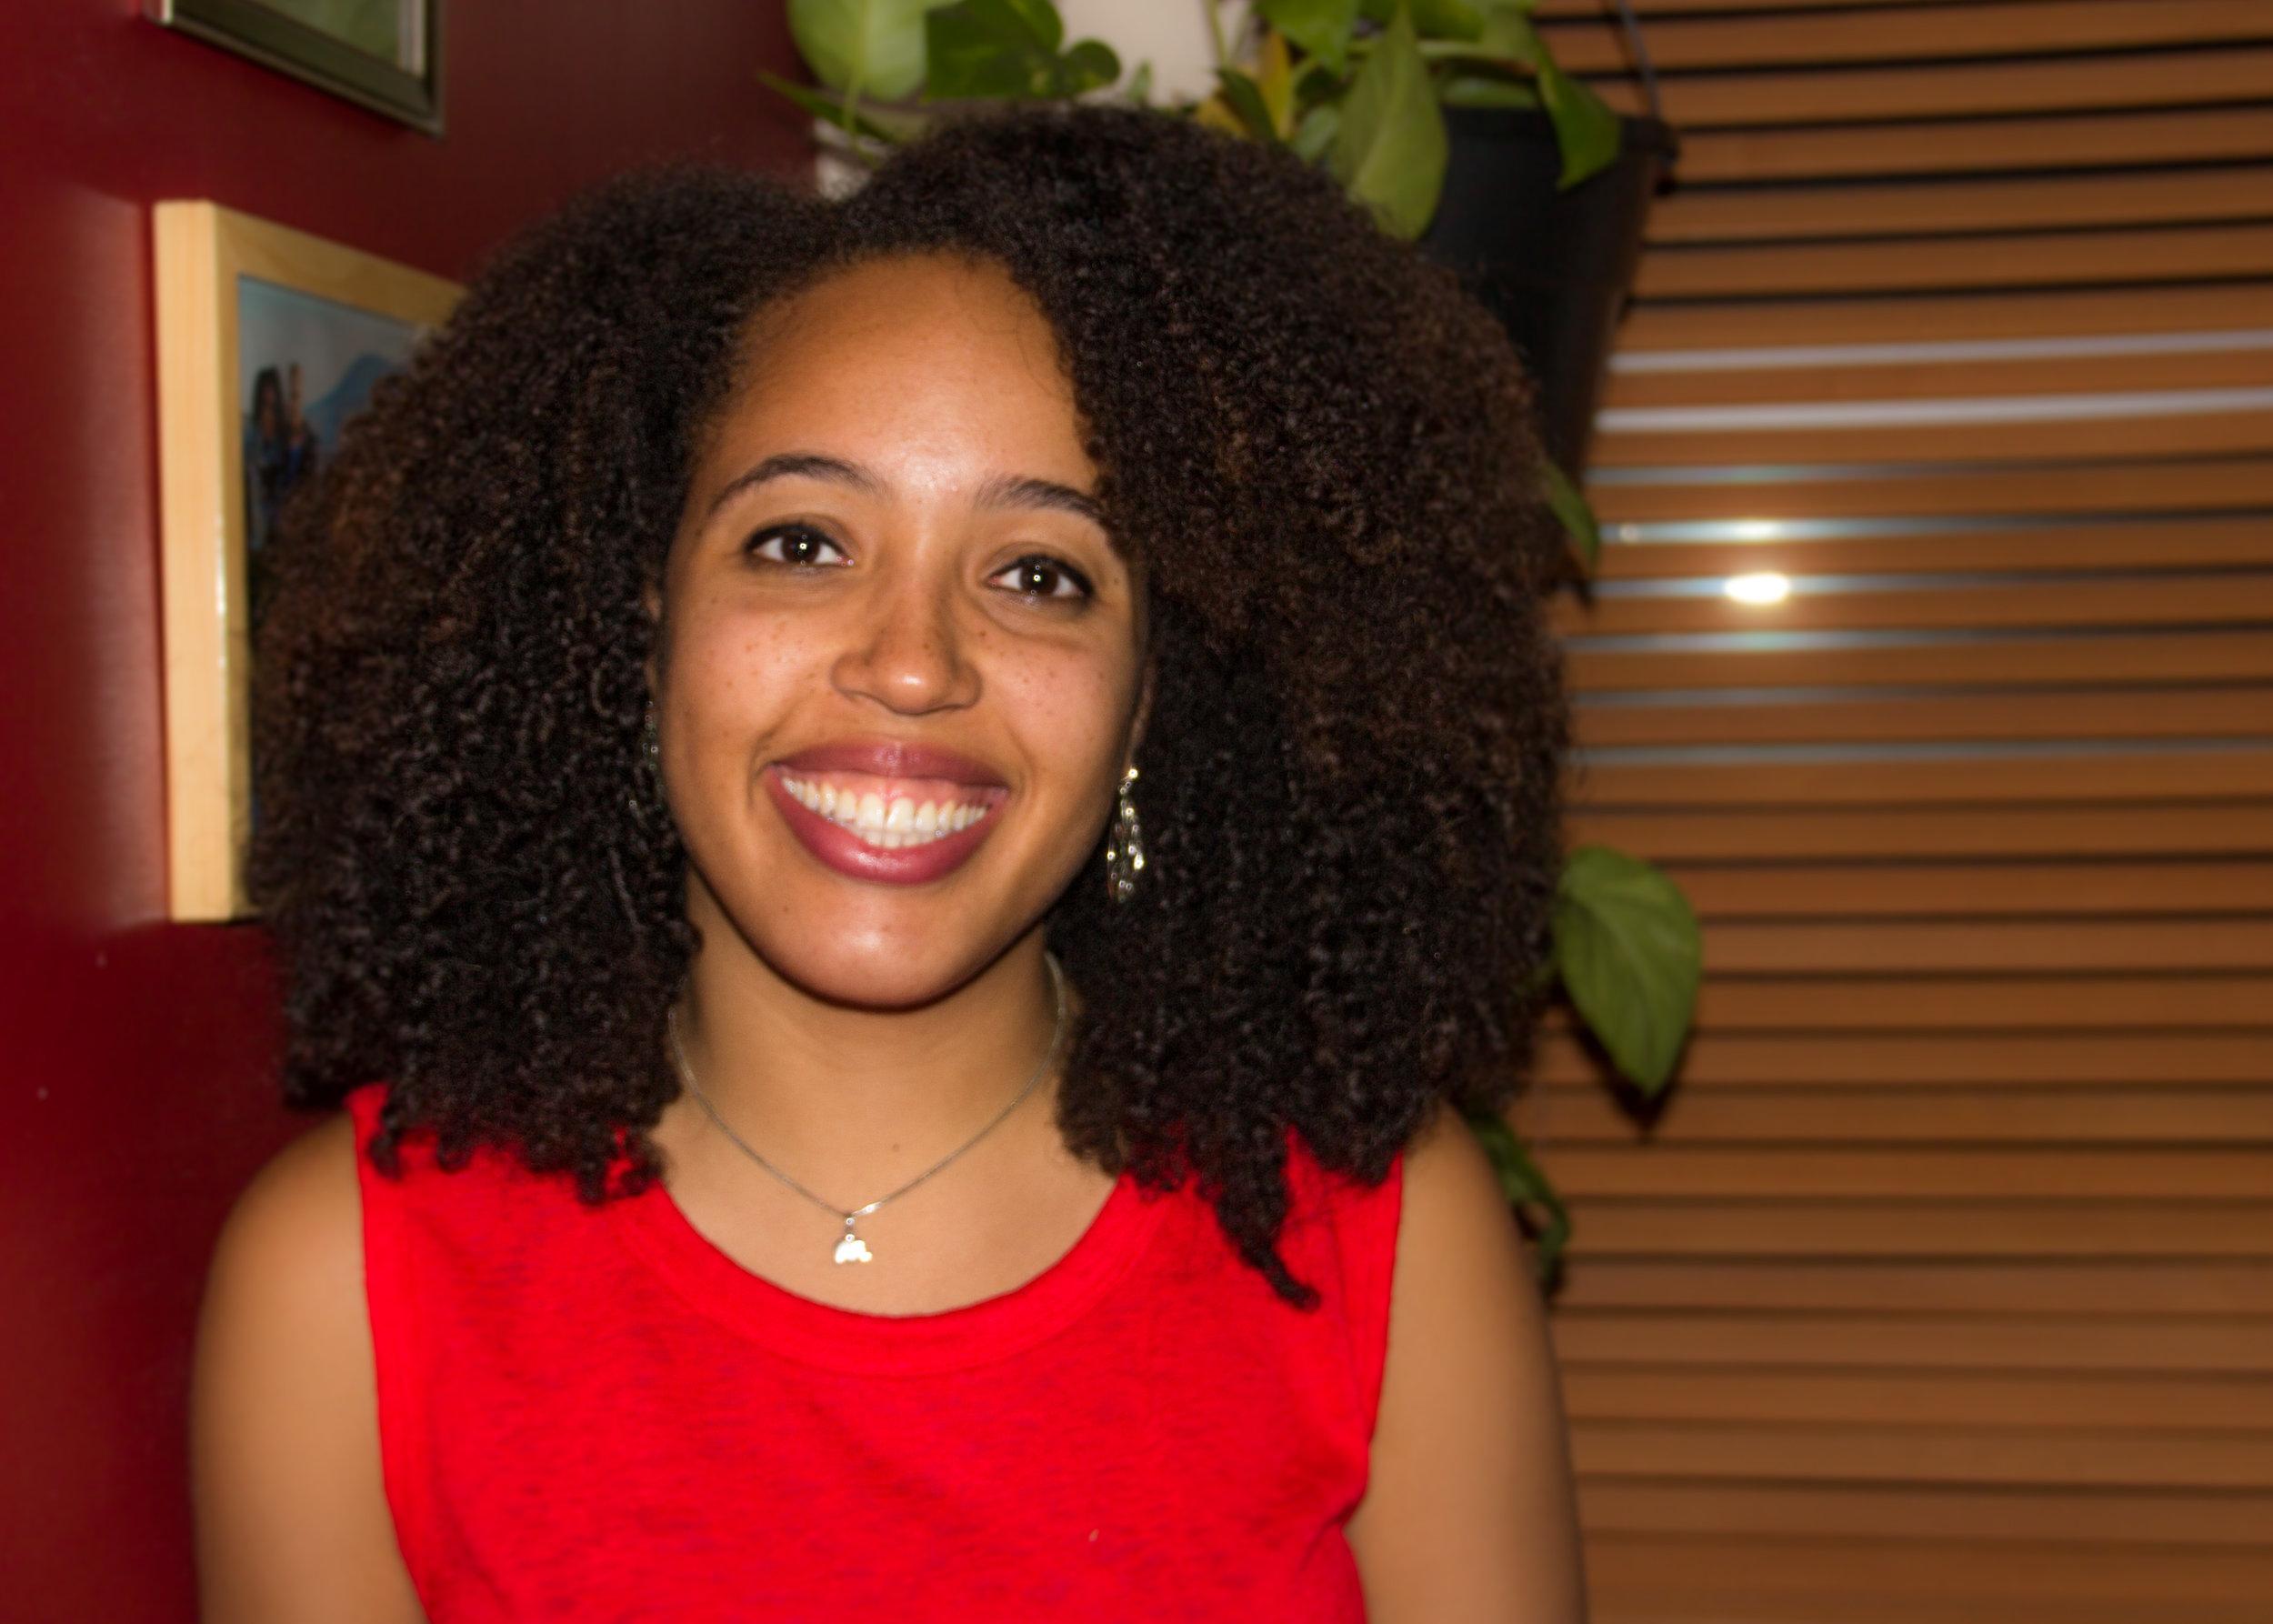 Melanie Schaffler - Neuroscience PhD Student (2018 - present)B.A., Wesleyan Universityschmel@pennmedicine.upenn.edu